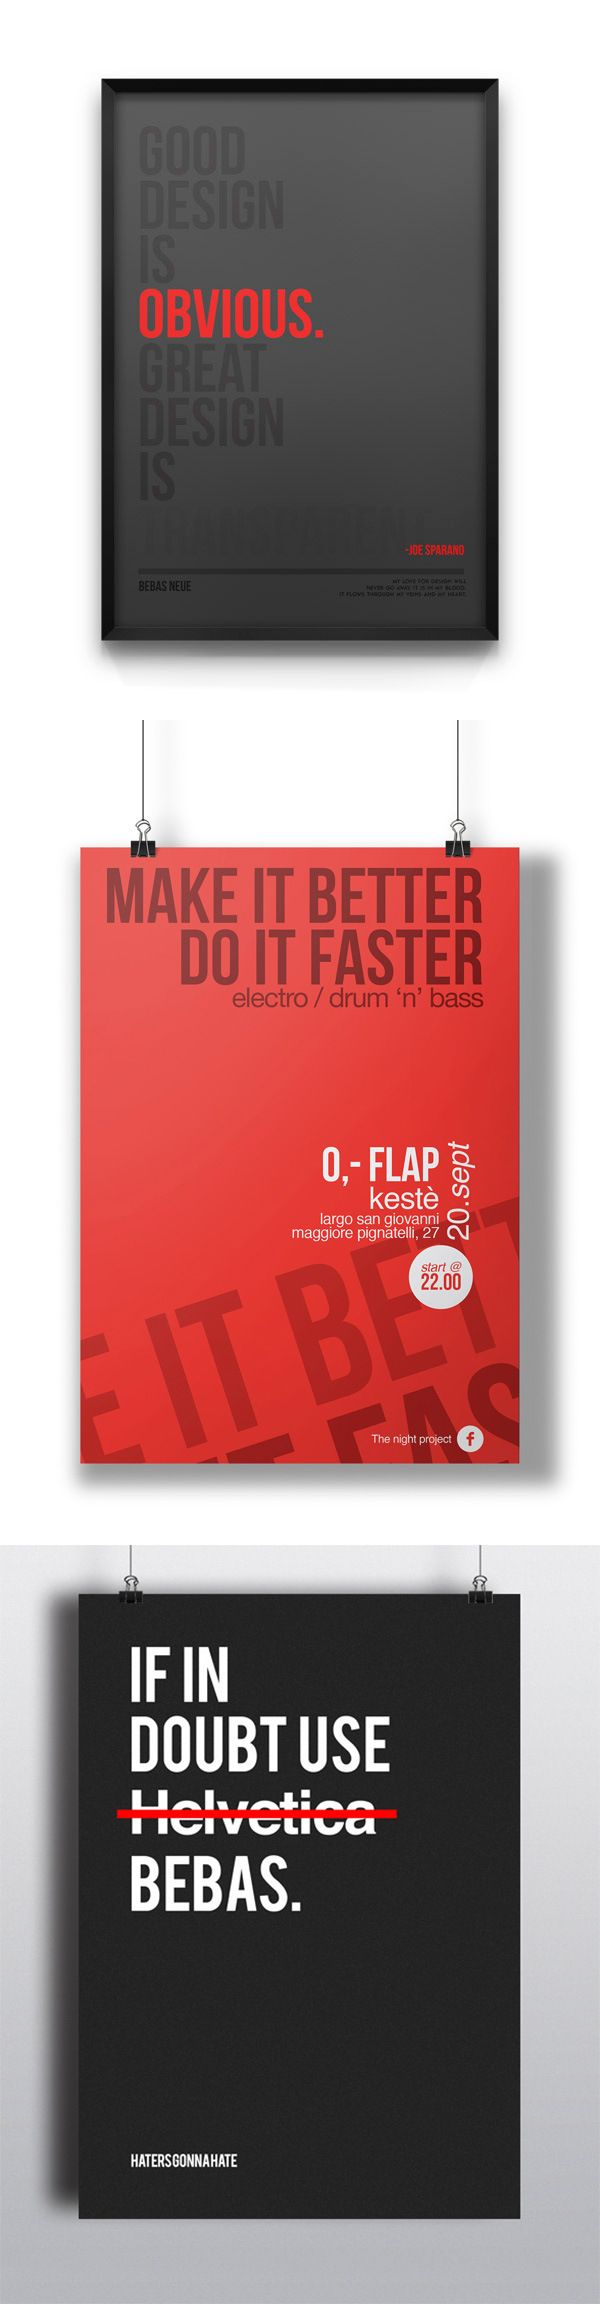 bebas09 Bebas Neue | Font | Free Download and great design examples